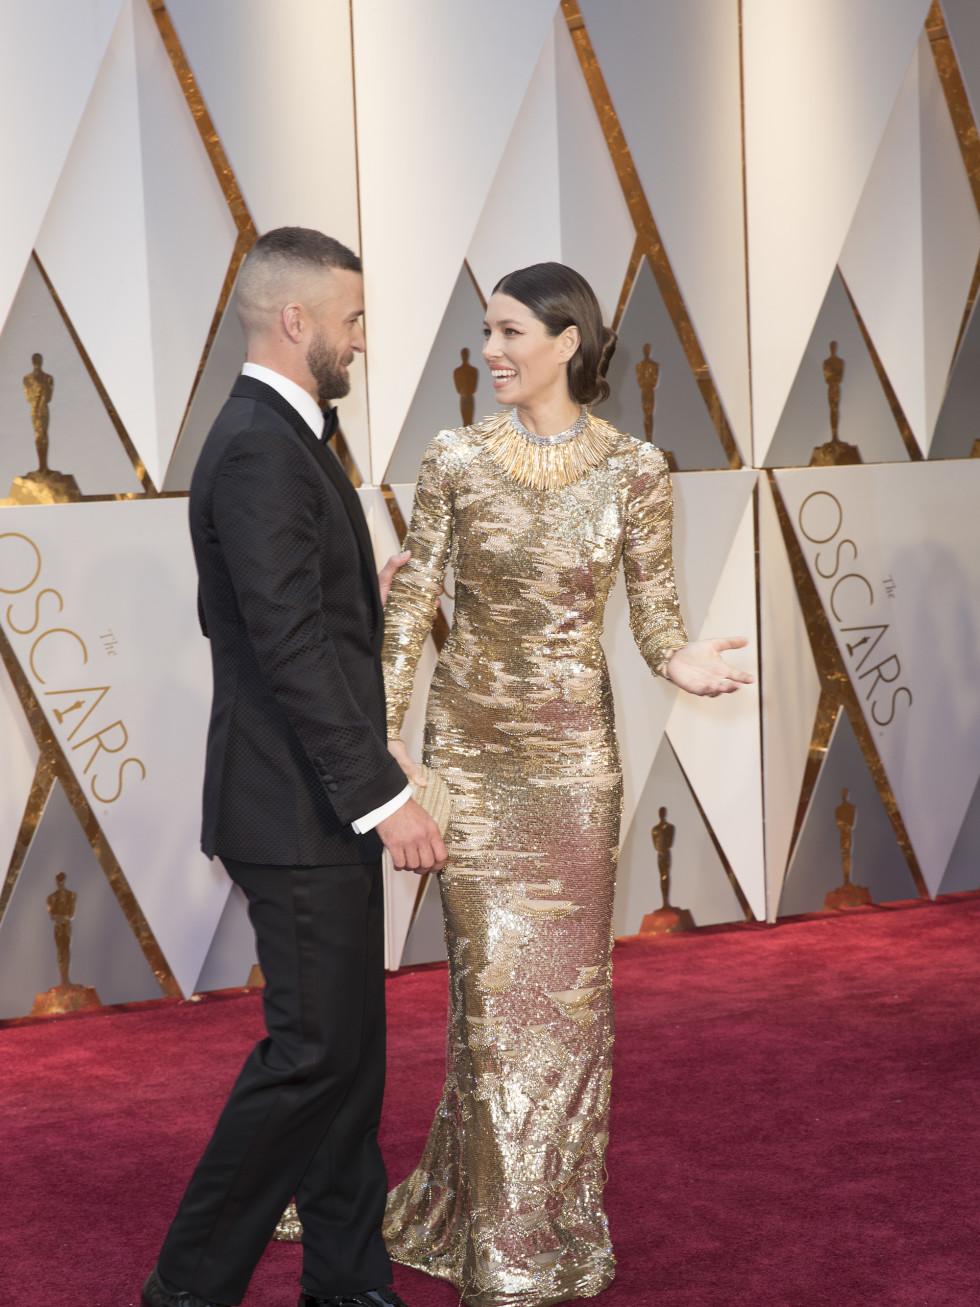 Justin Timberlake and Jessica Biel at 2017 Oscars